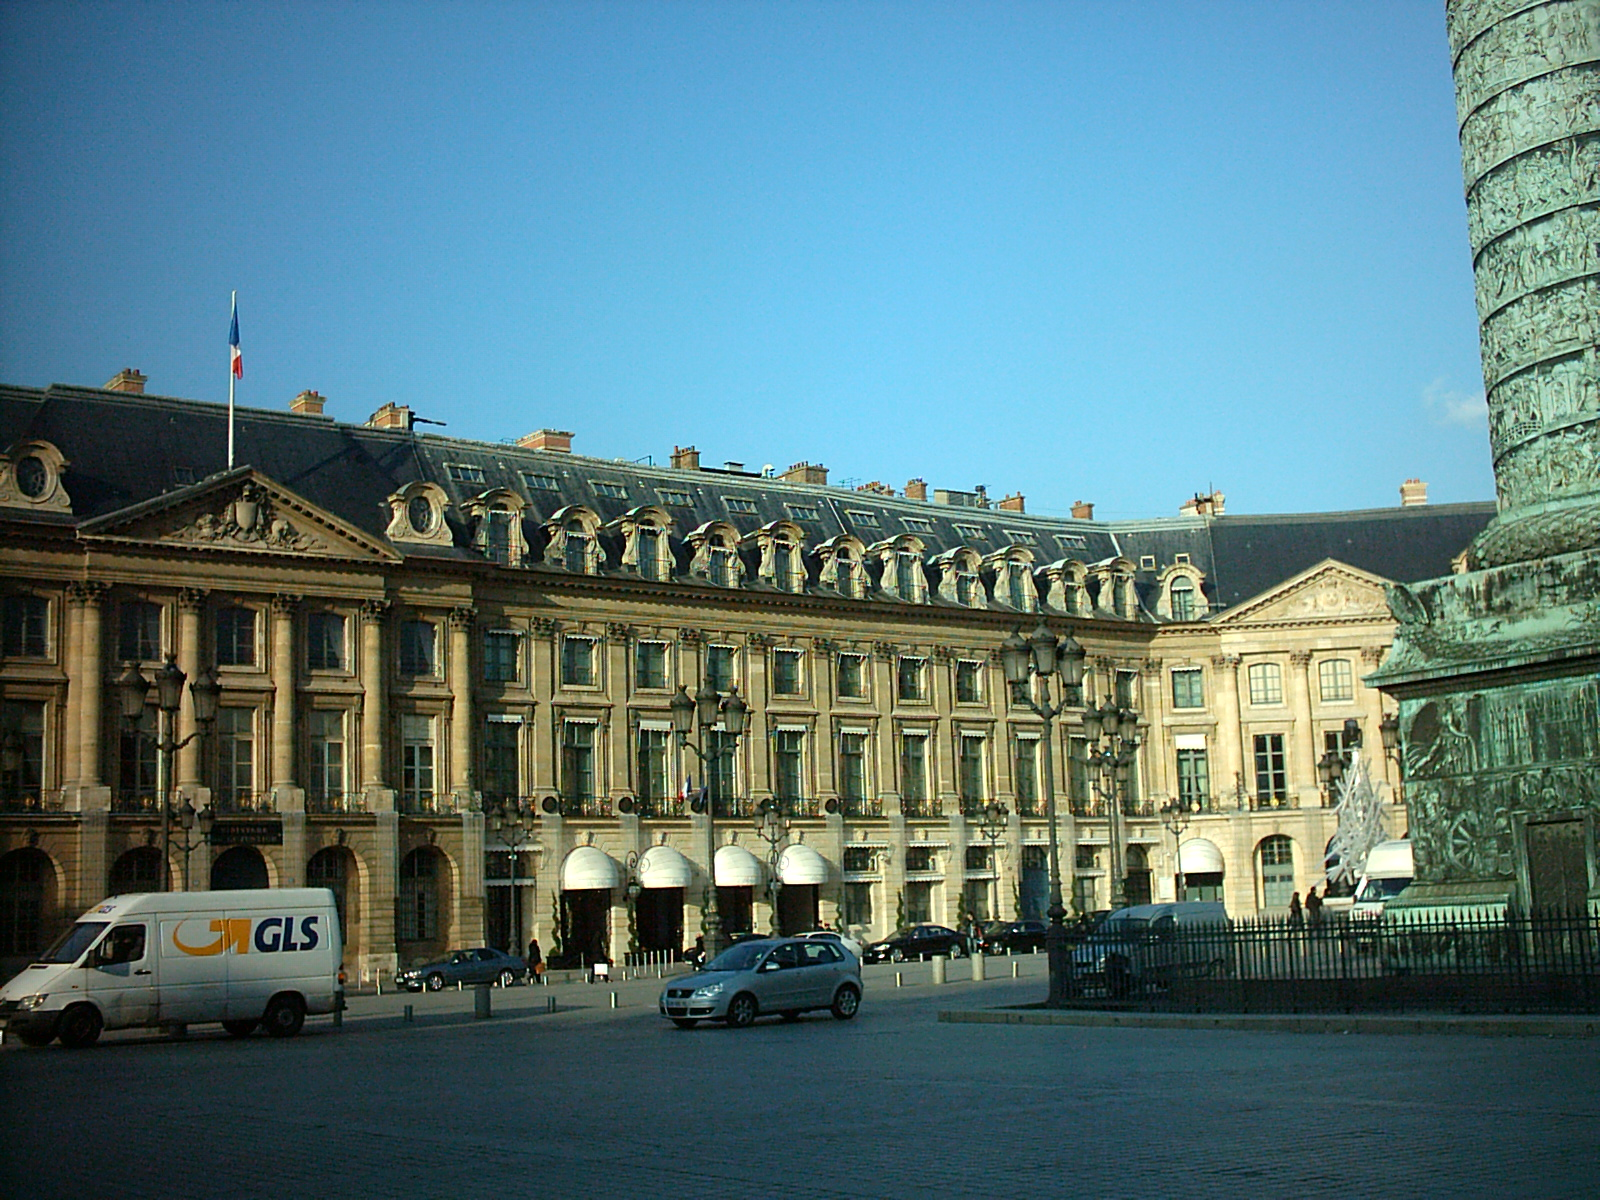 The Ritz Hotel on Place Vendome in Paris